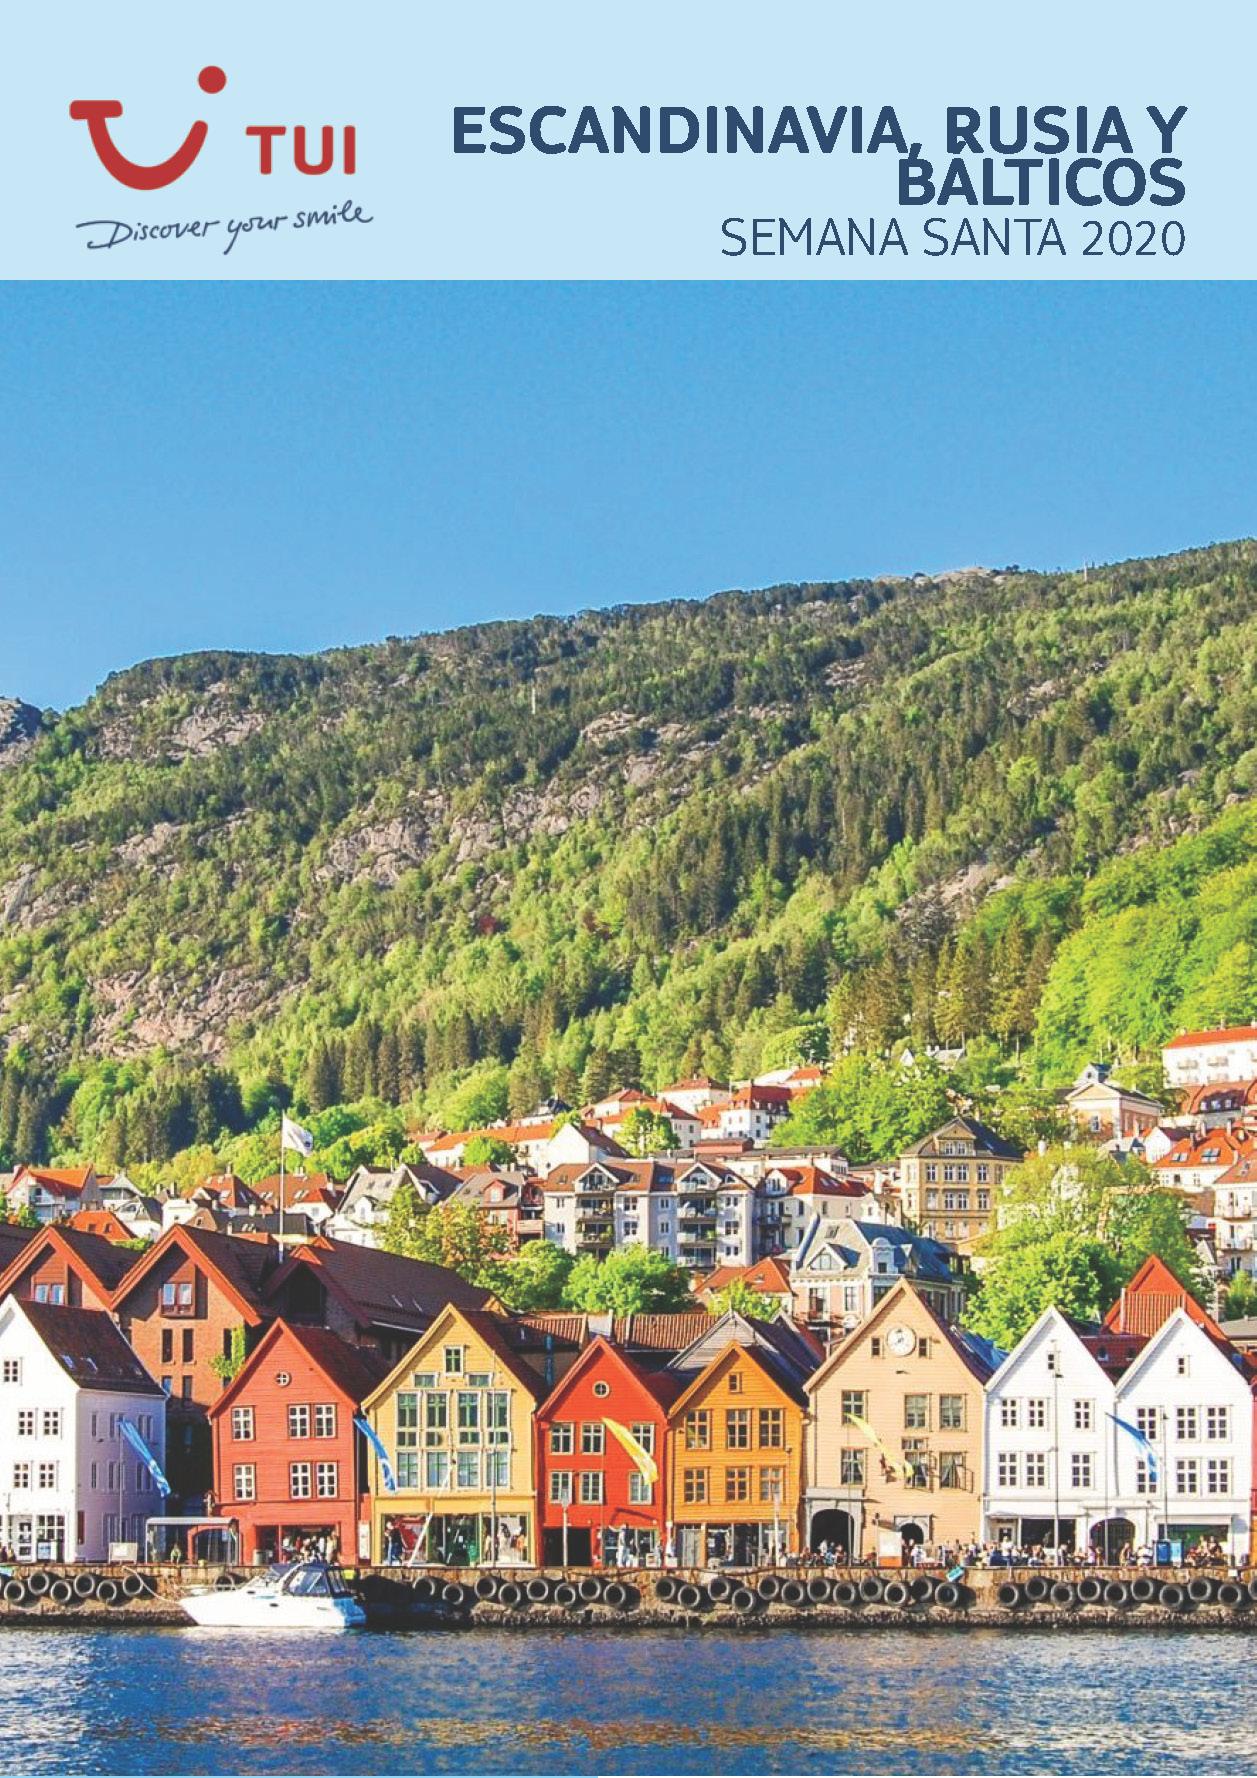 Catalogo TUI Ambassador Tours Semana Santa 2020 Escandinavia Rusia y Balticos